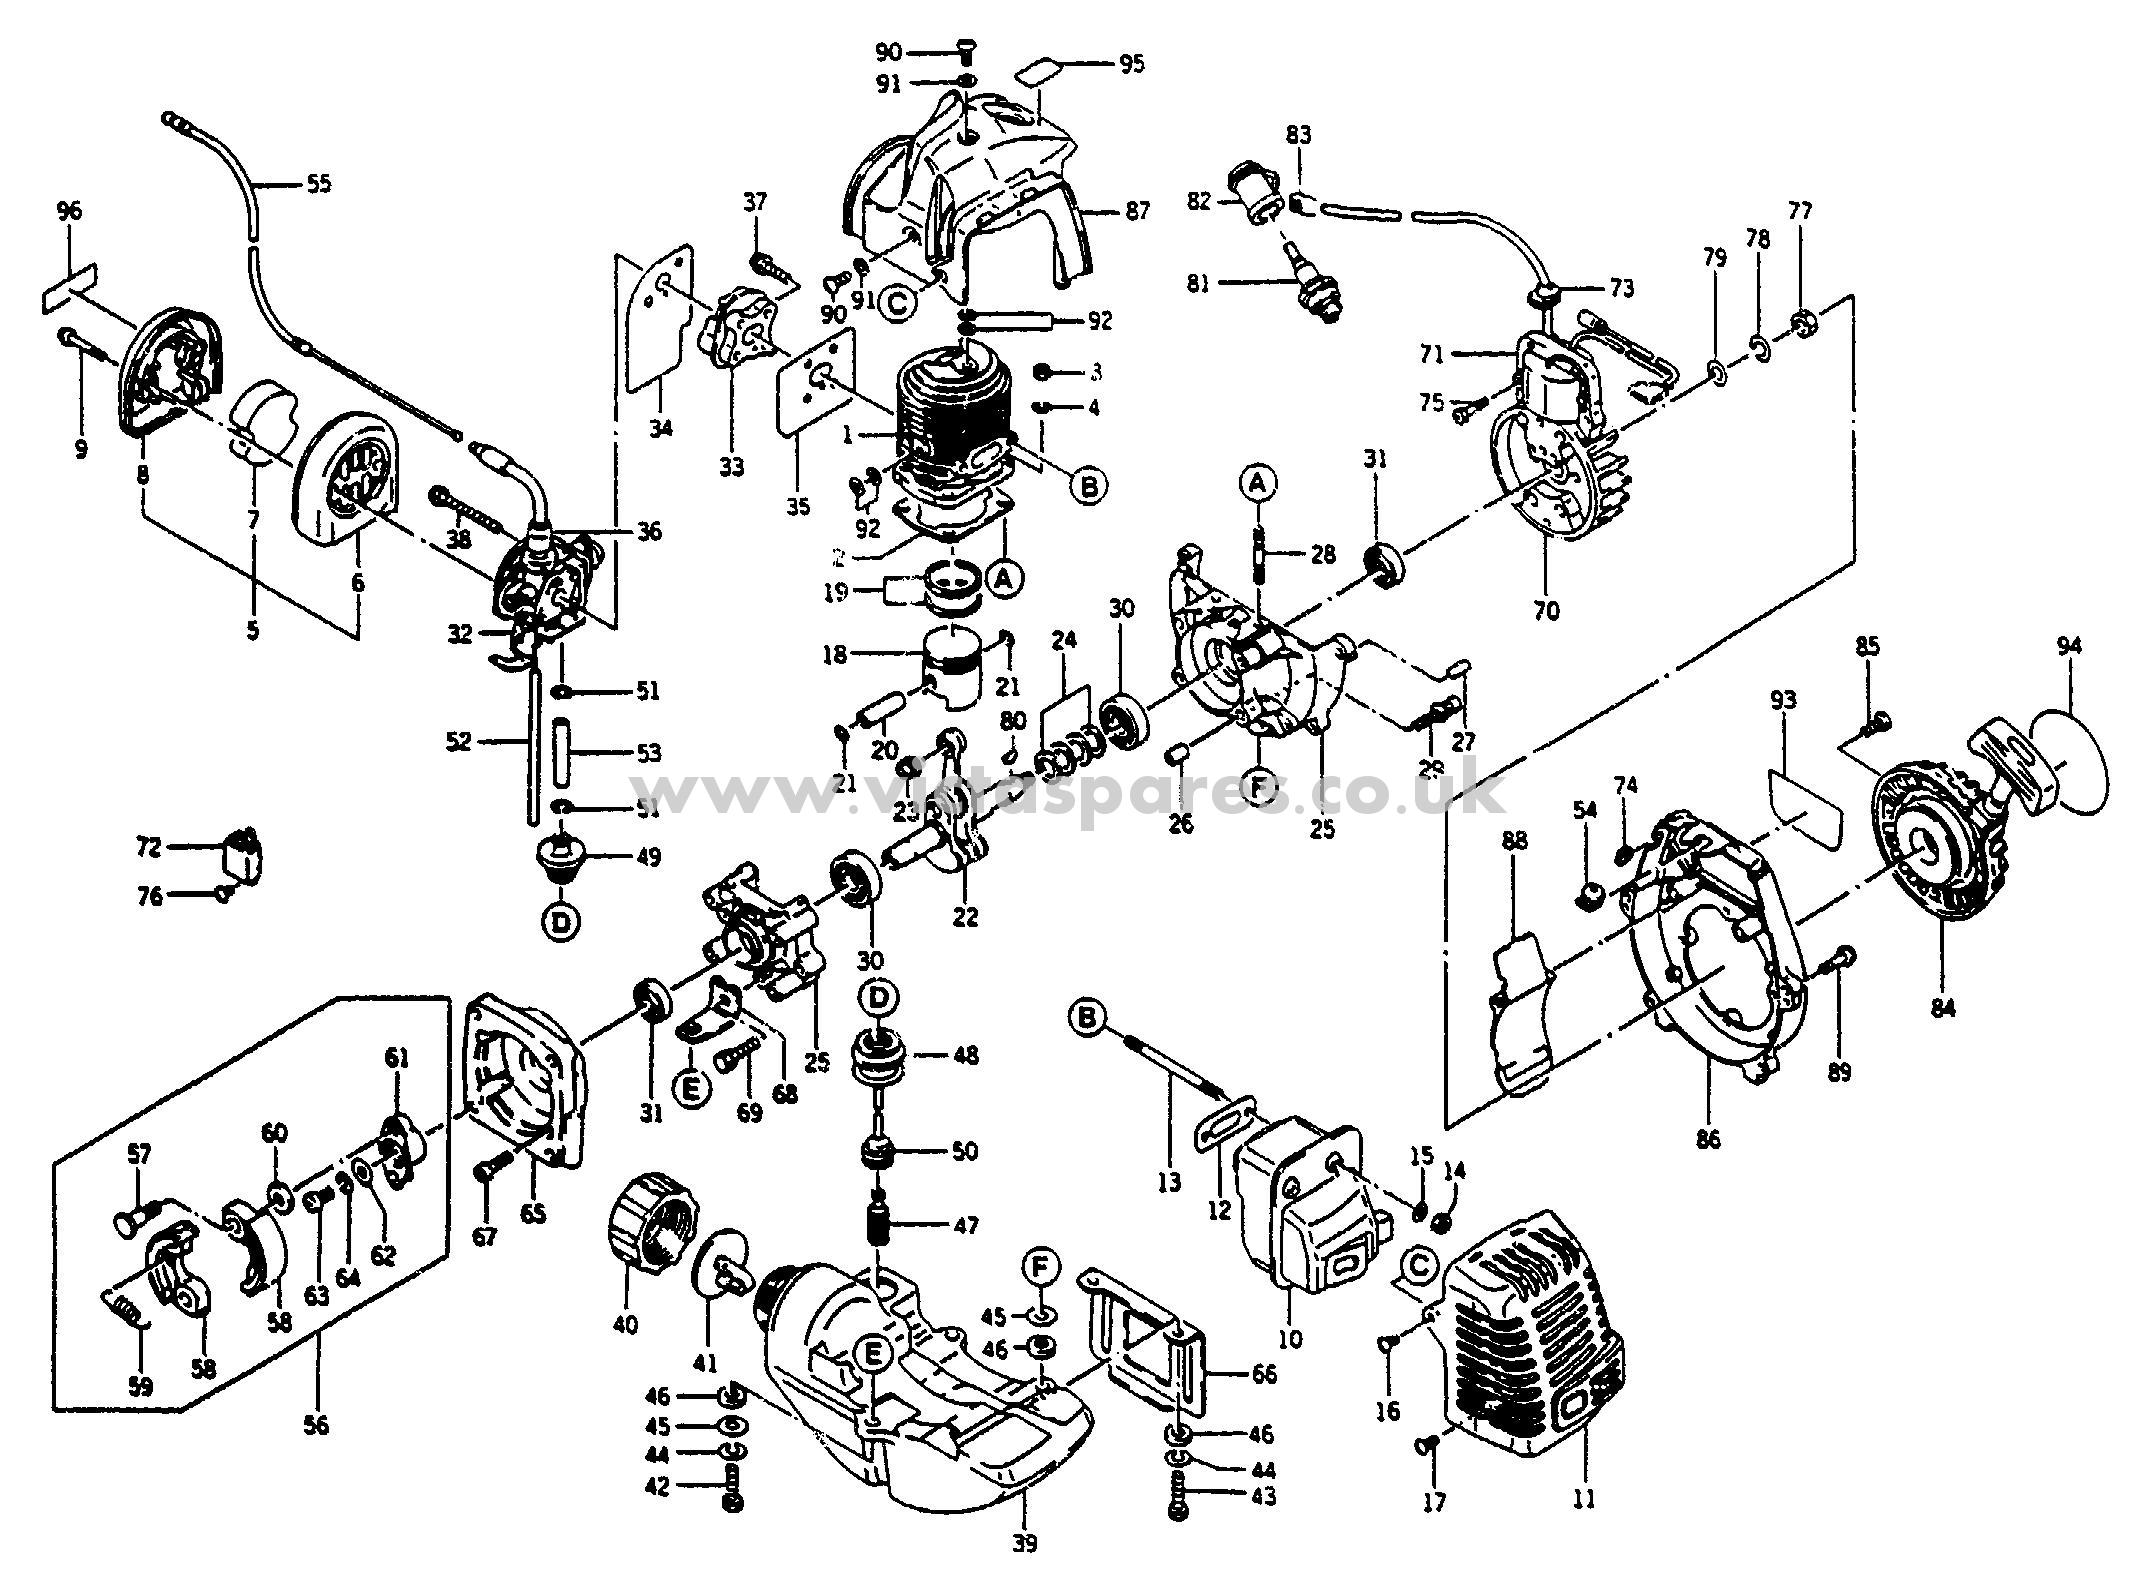 Starter Motor Parts List